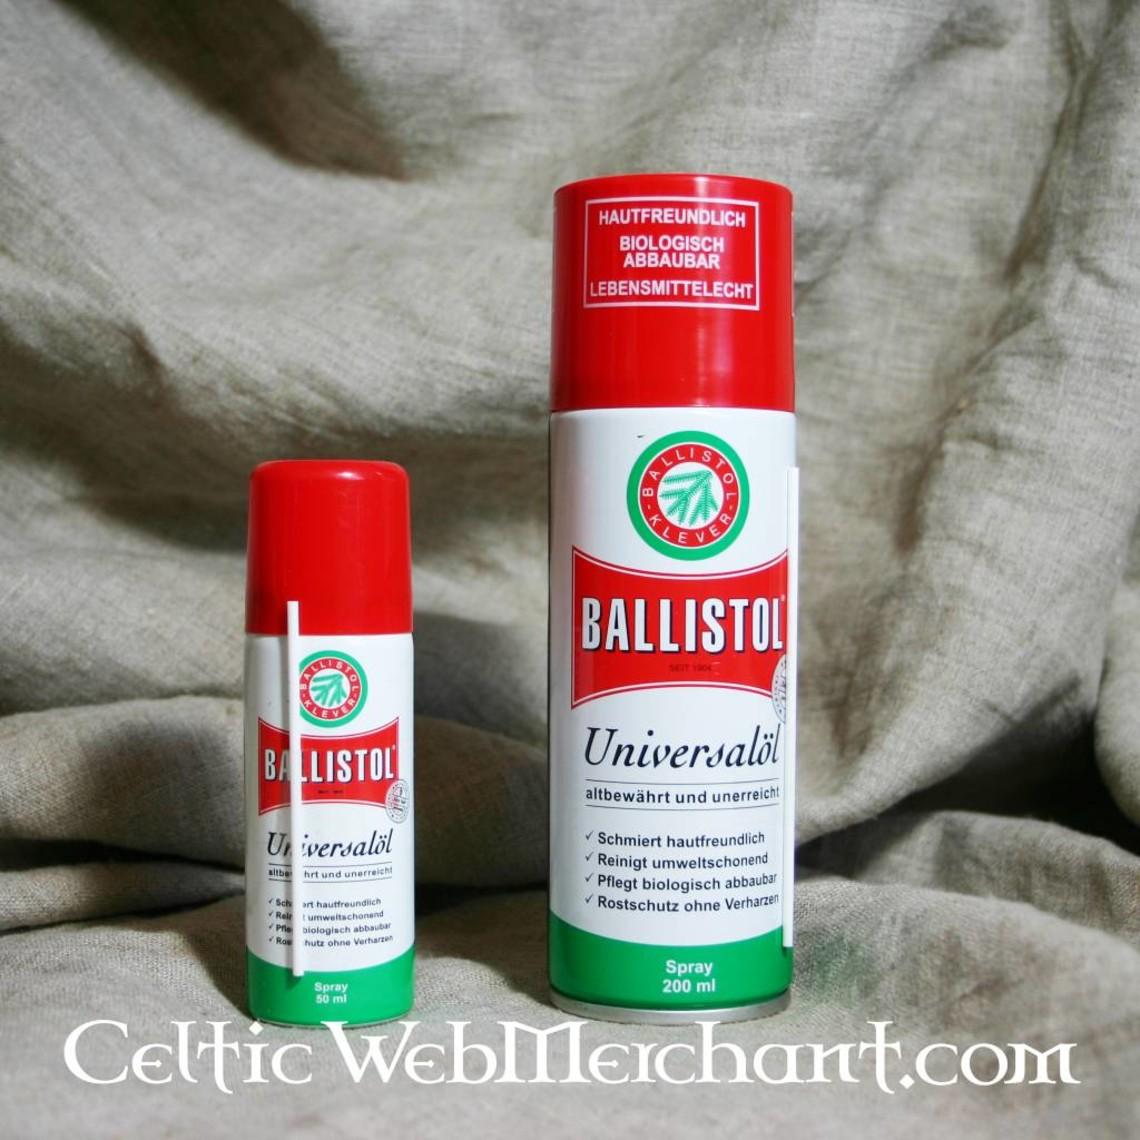 Ballistol Ballistol antiroestspray, 200 ml (enkel EU)